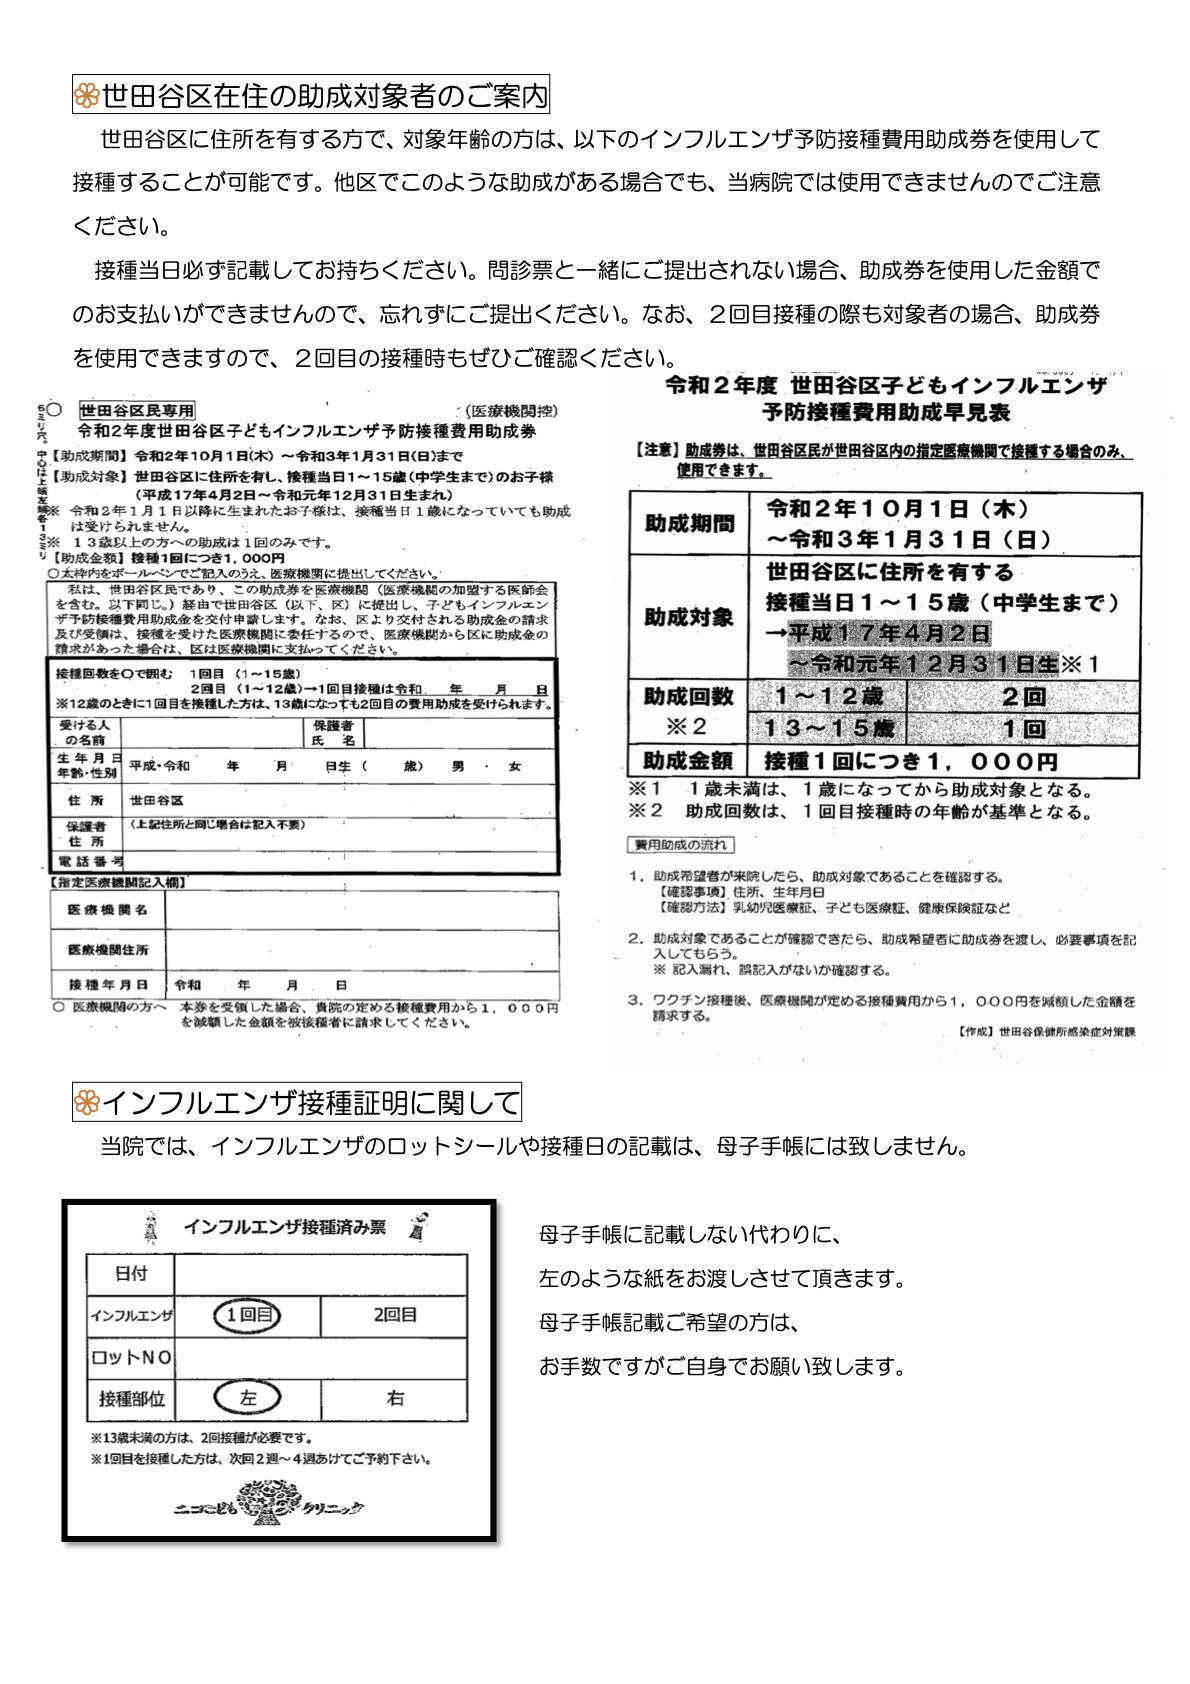 flu-2020-information-ver02-04